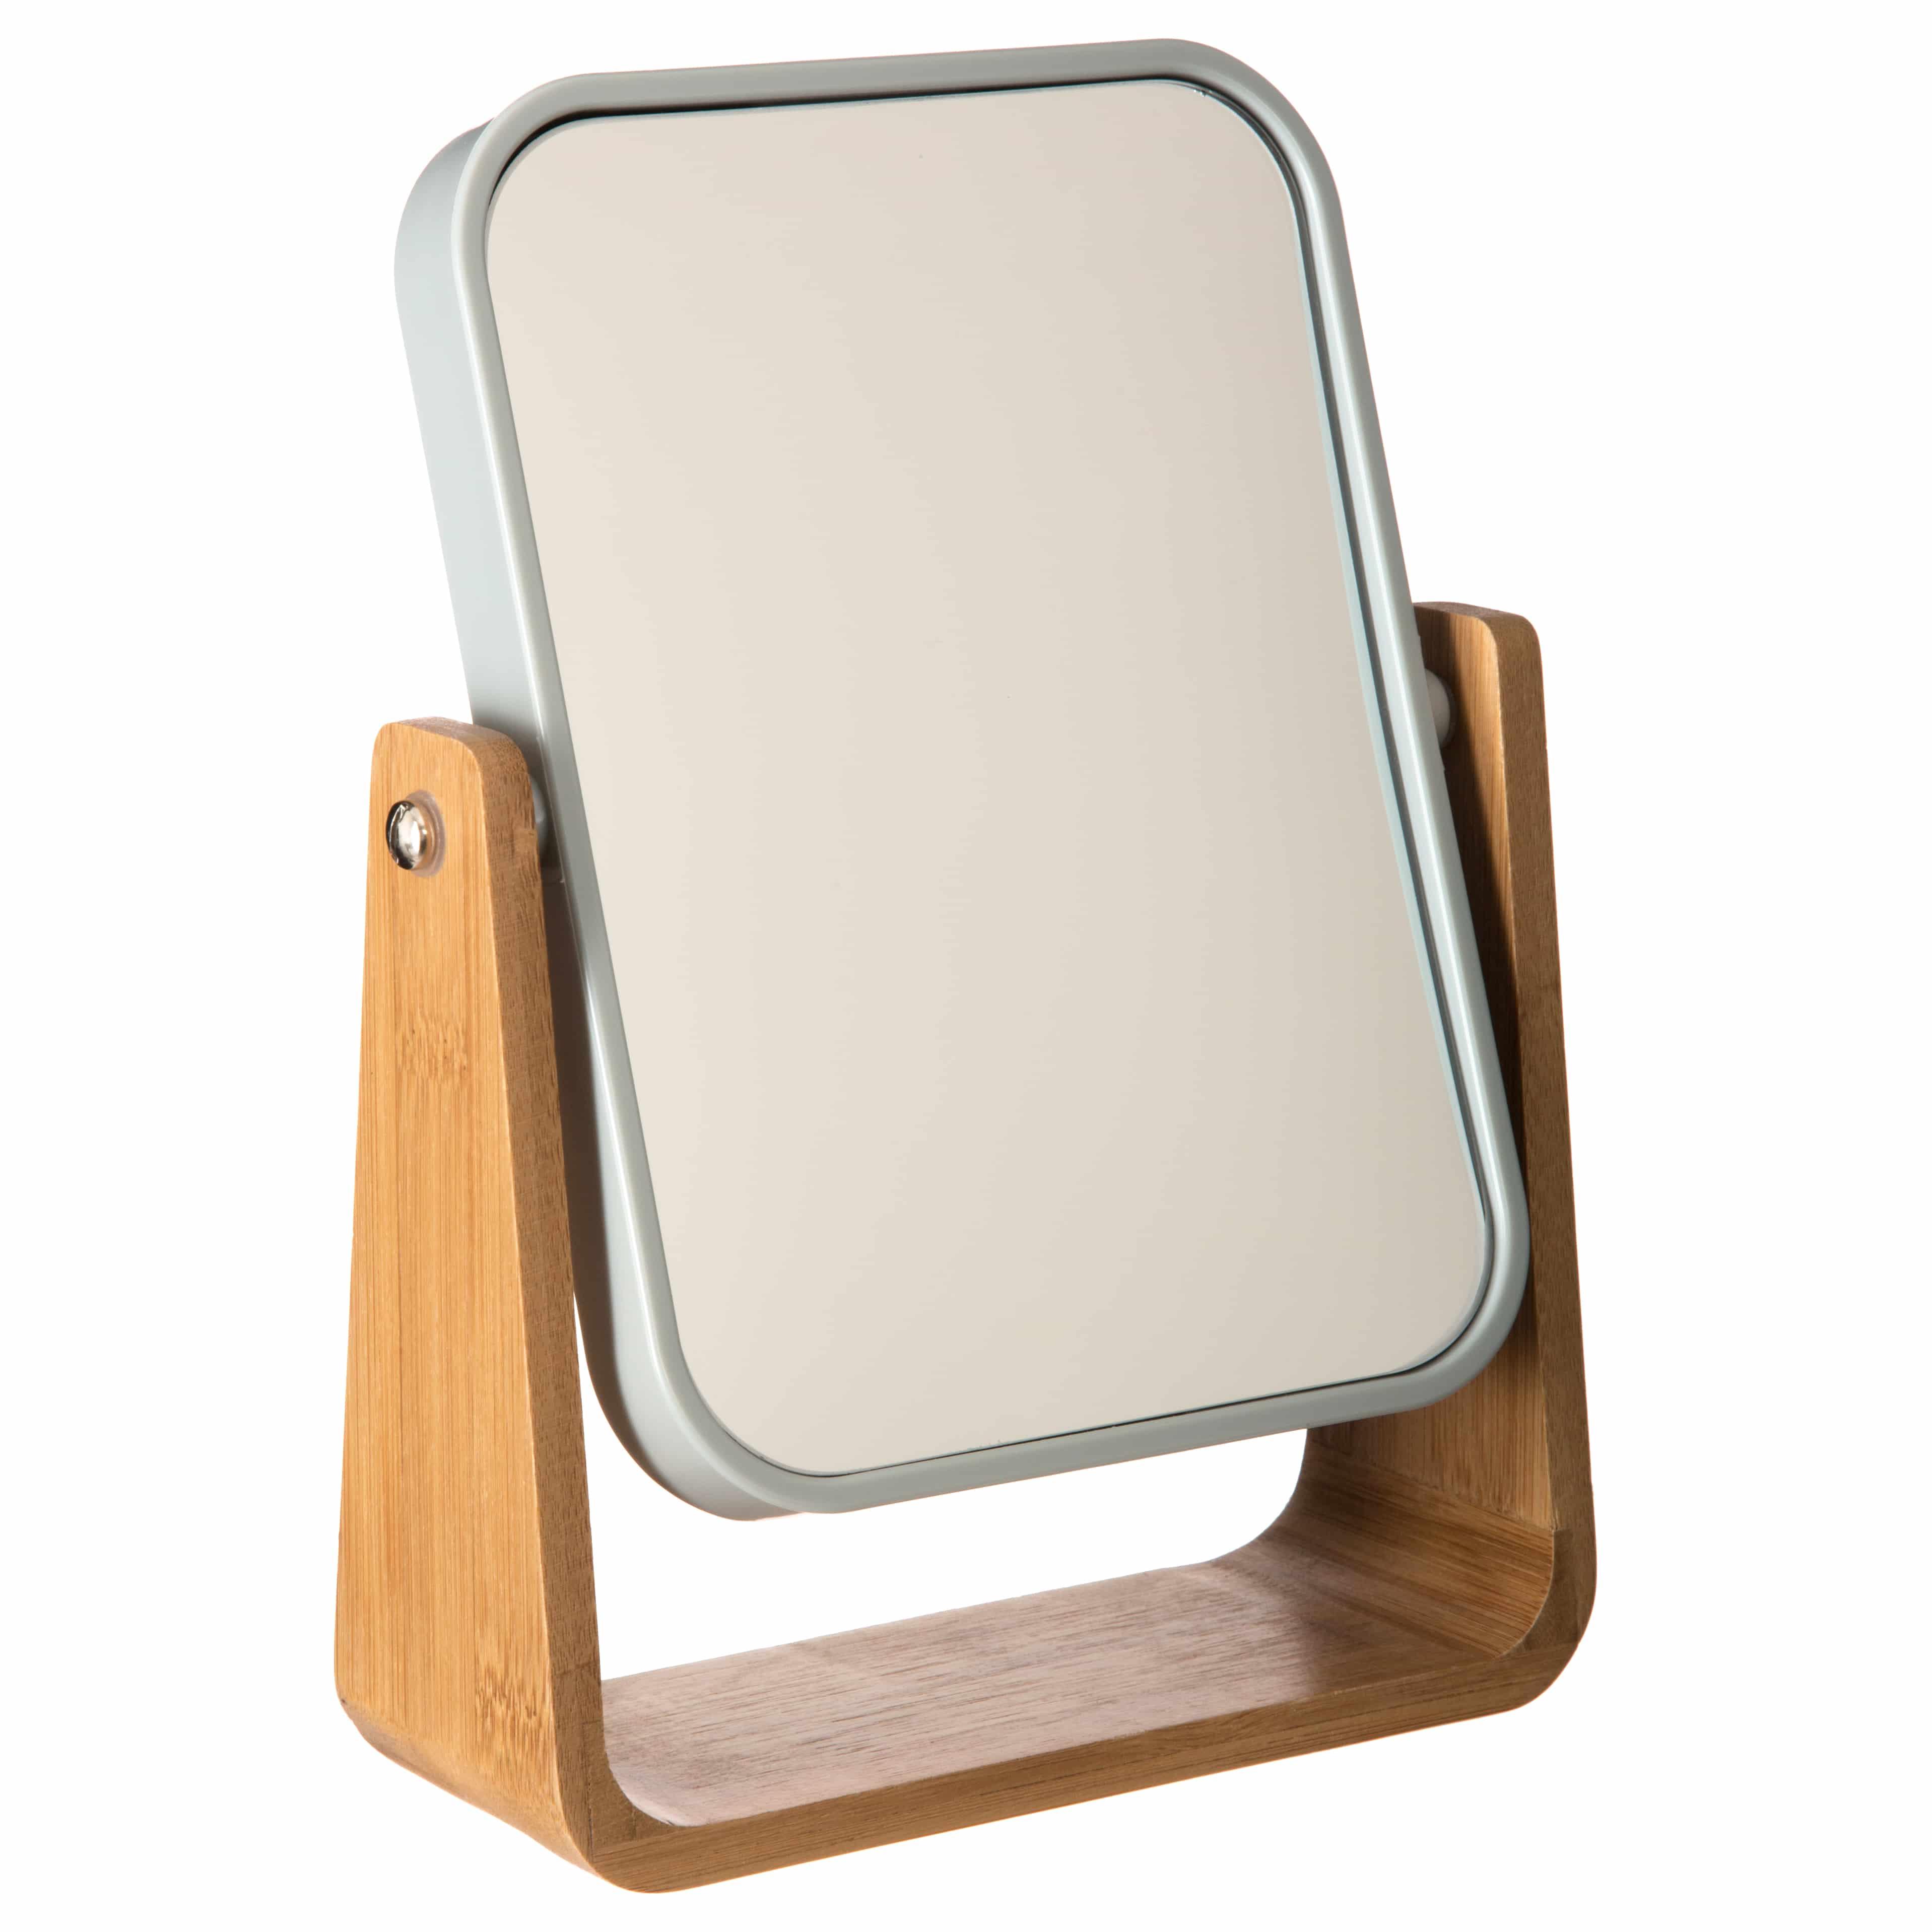 4goodz make-up spiegeltje bamboe 16x22x6 cm Vergroot 3x - wit/bruin